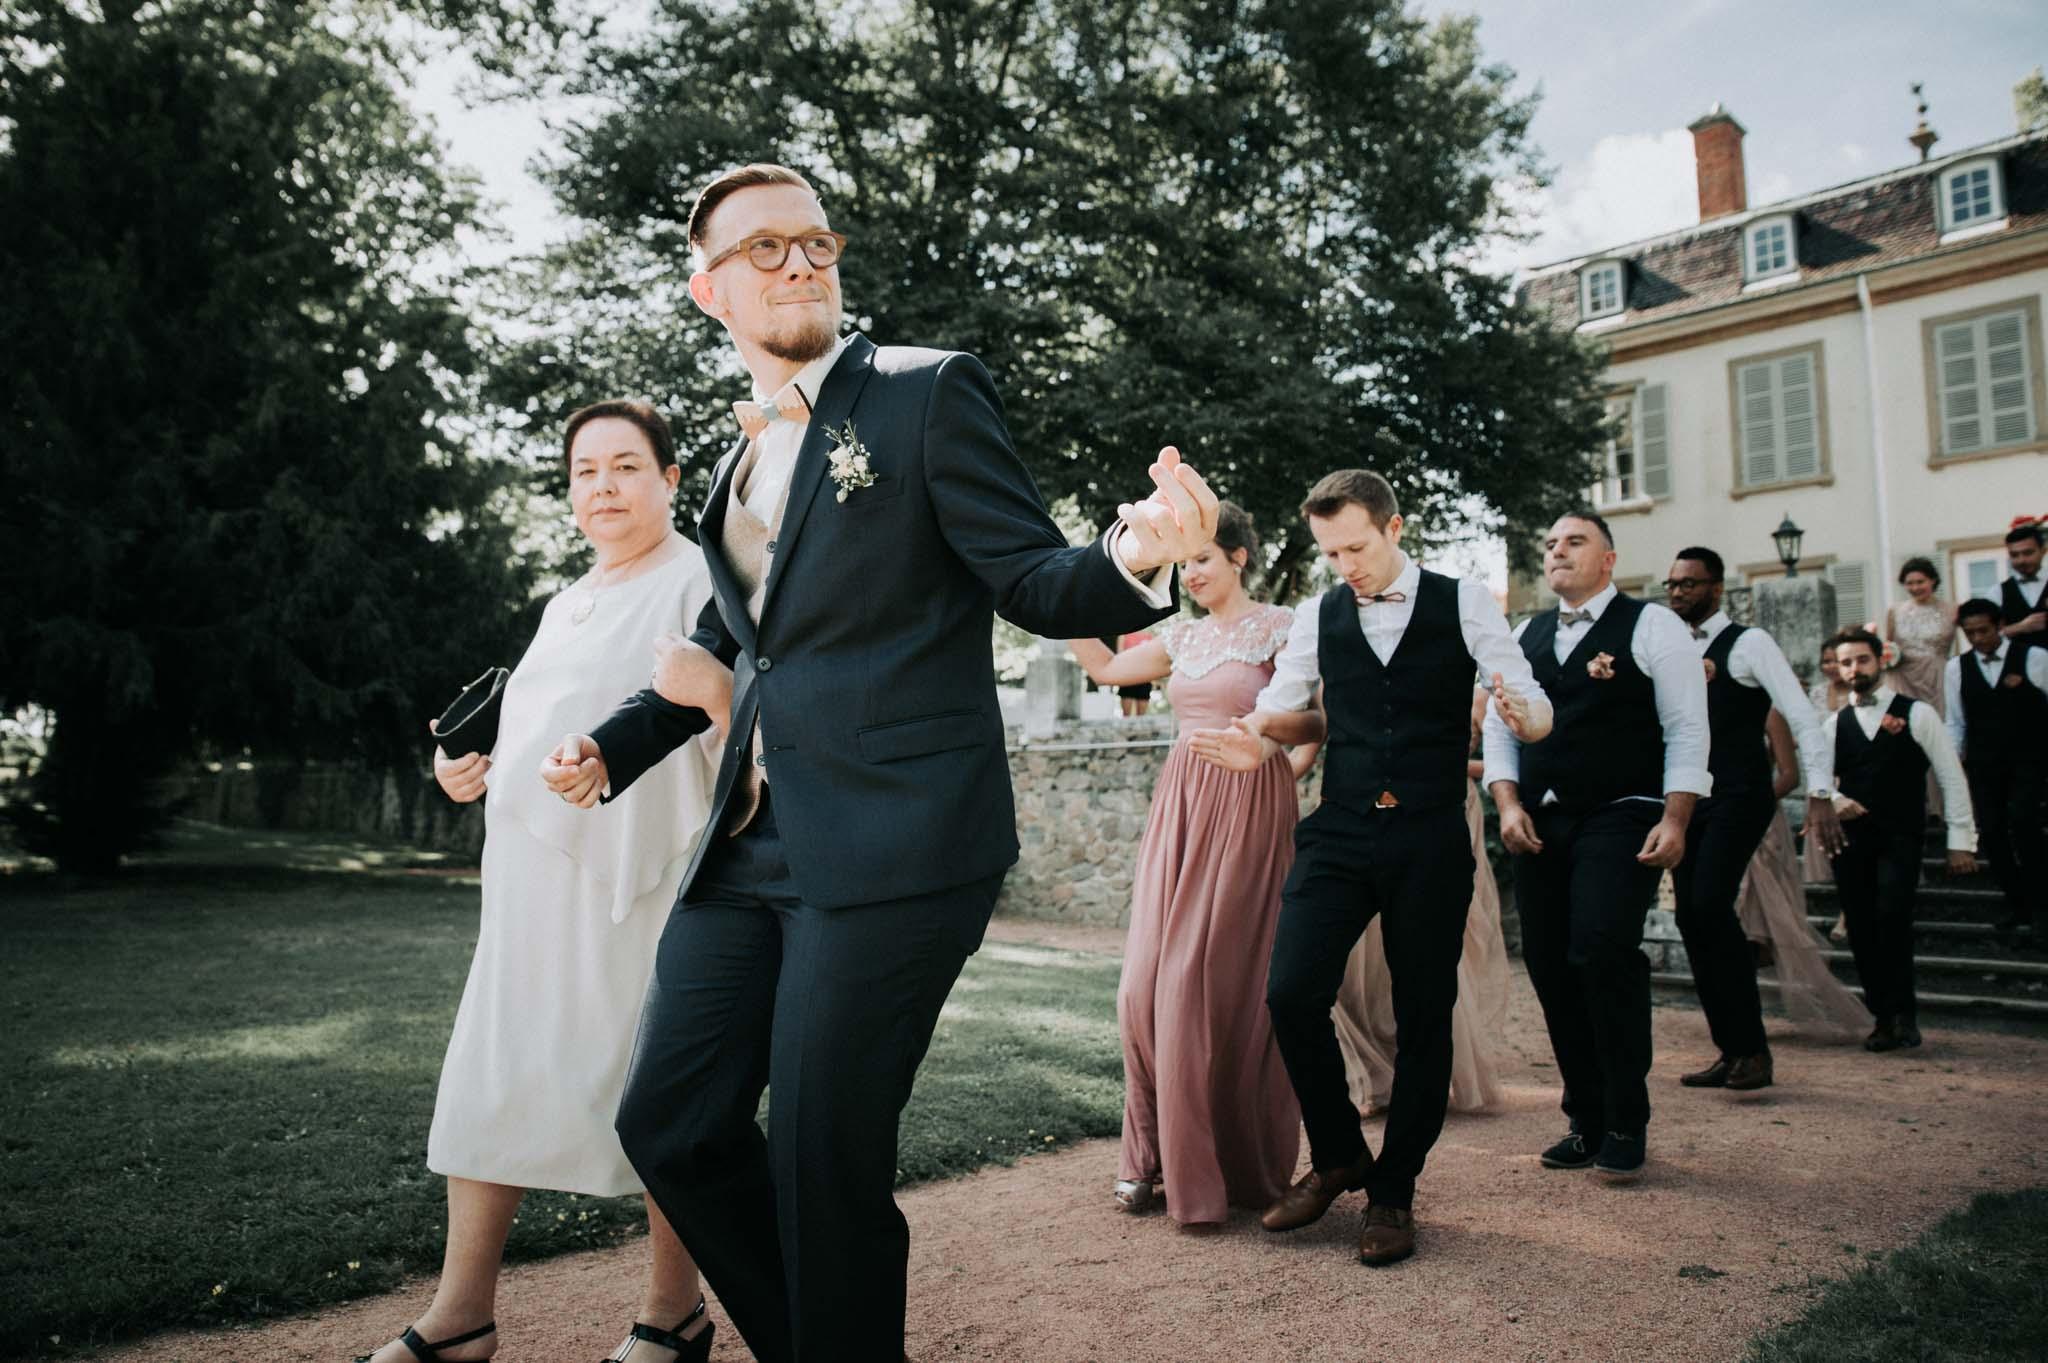 2017-07-15 - DSC_8004 - photographe - mariage - www.lauriediazwedding.com.jpg